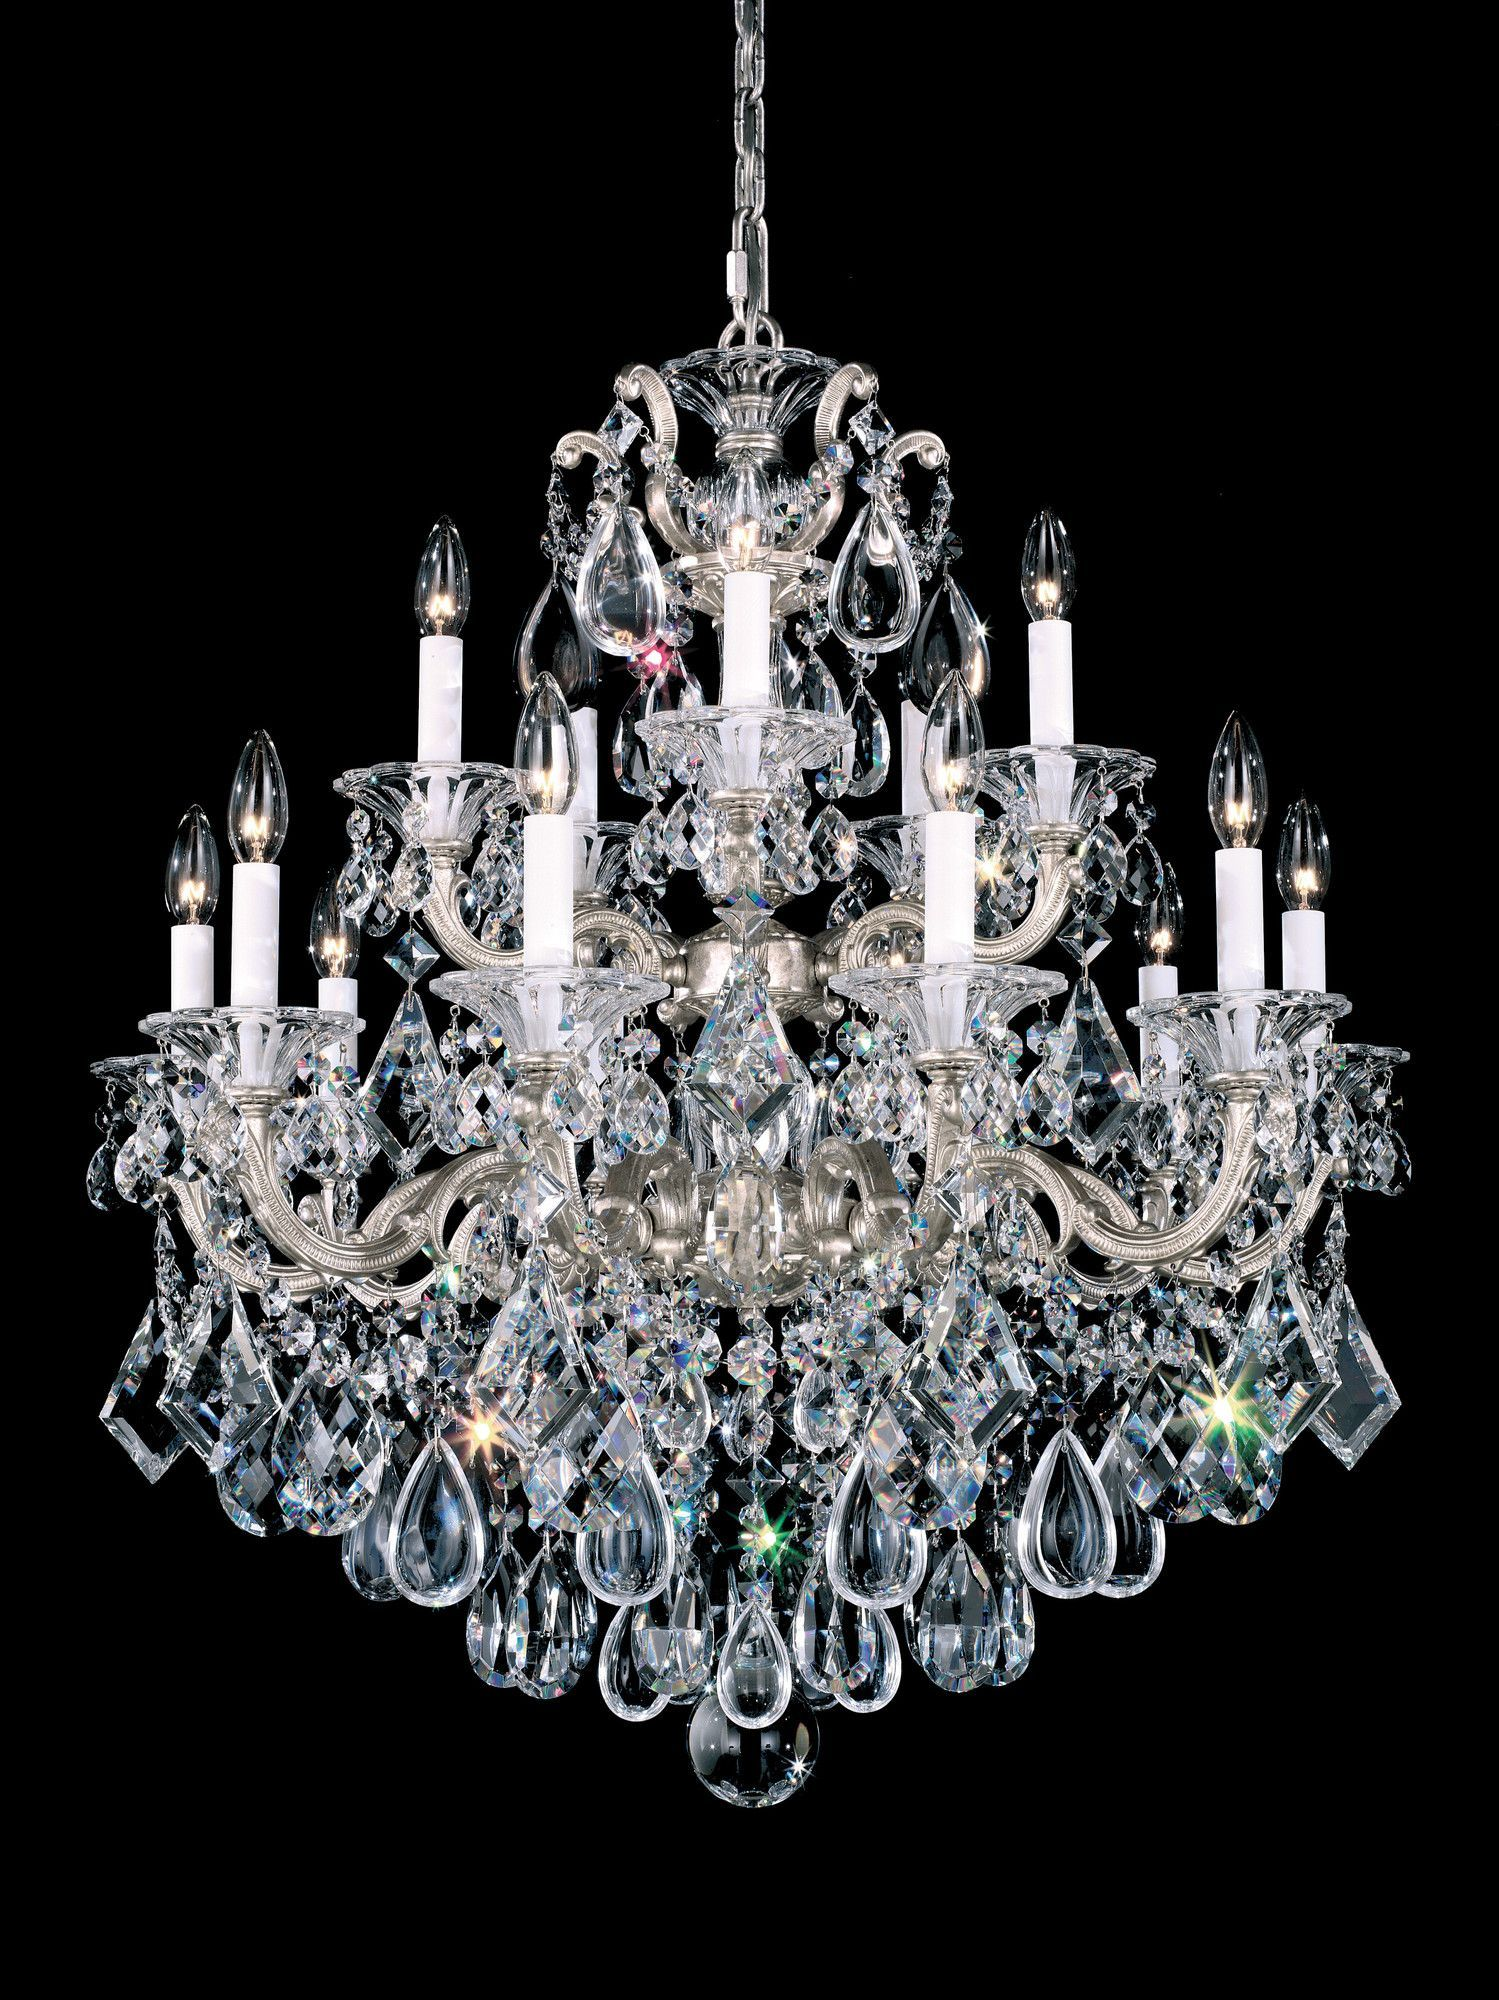 chandelier l cheap chandeliers com fake pixball diy best crystal